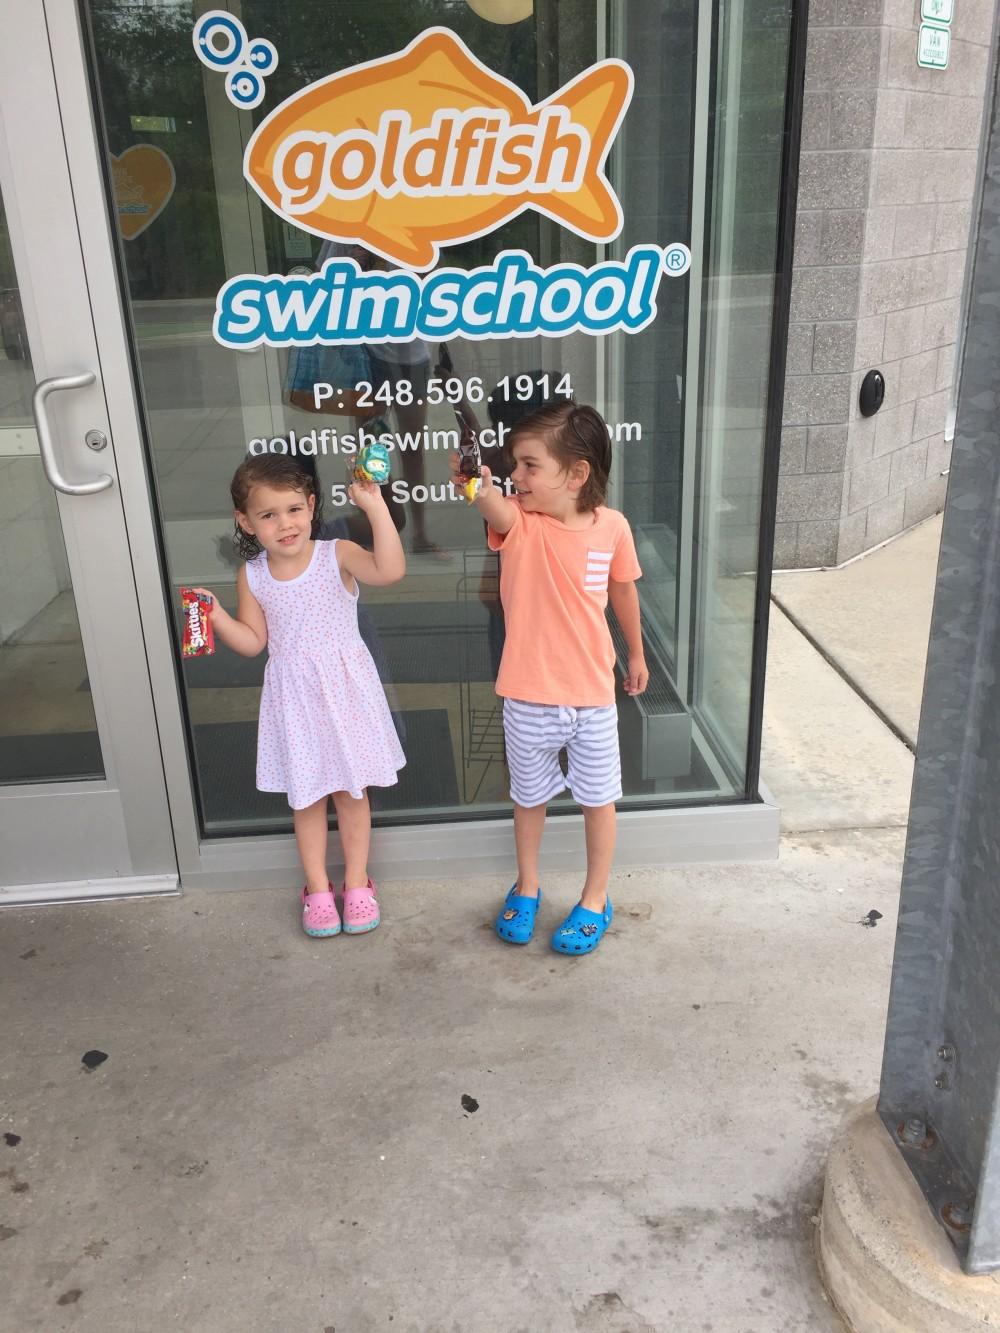 ways to make swim lessons go smoothly